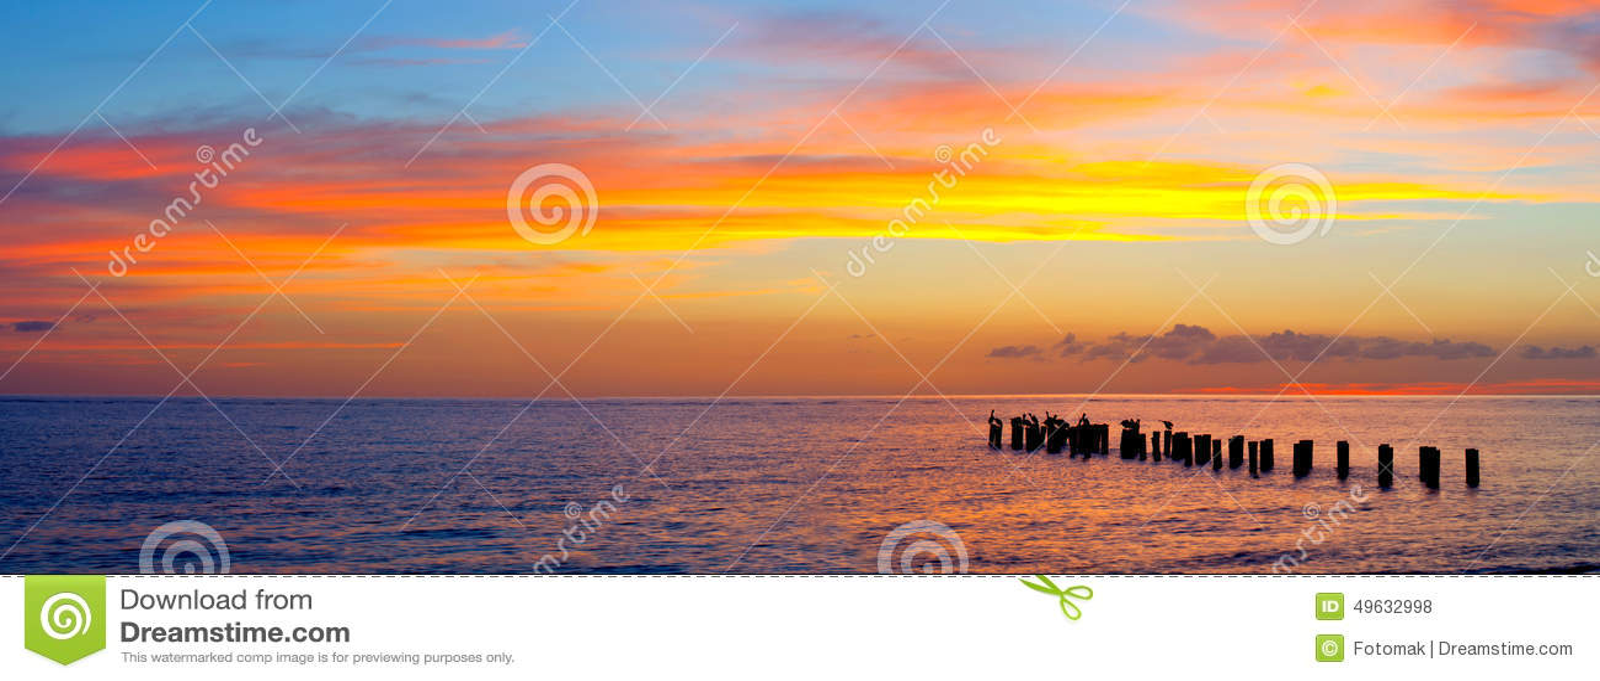 Sunset or sunrise landscape, panorama of beautiful nature, beach